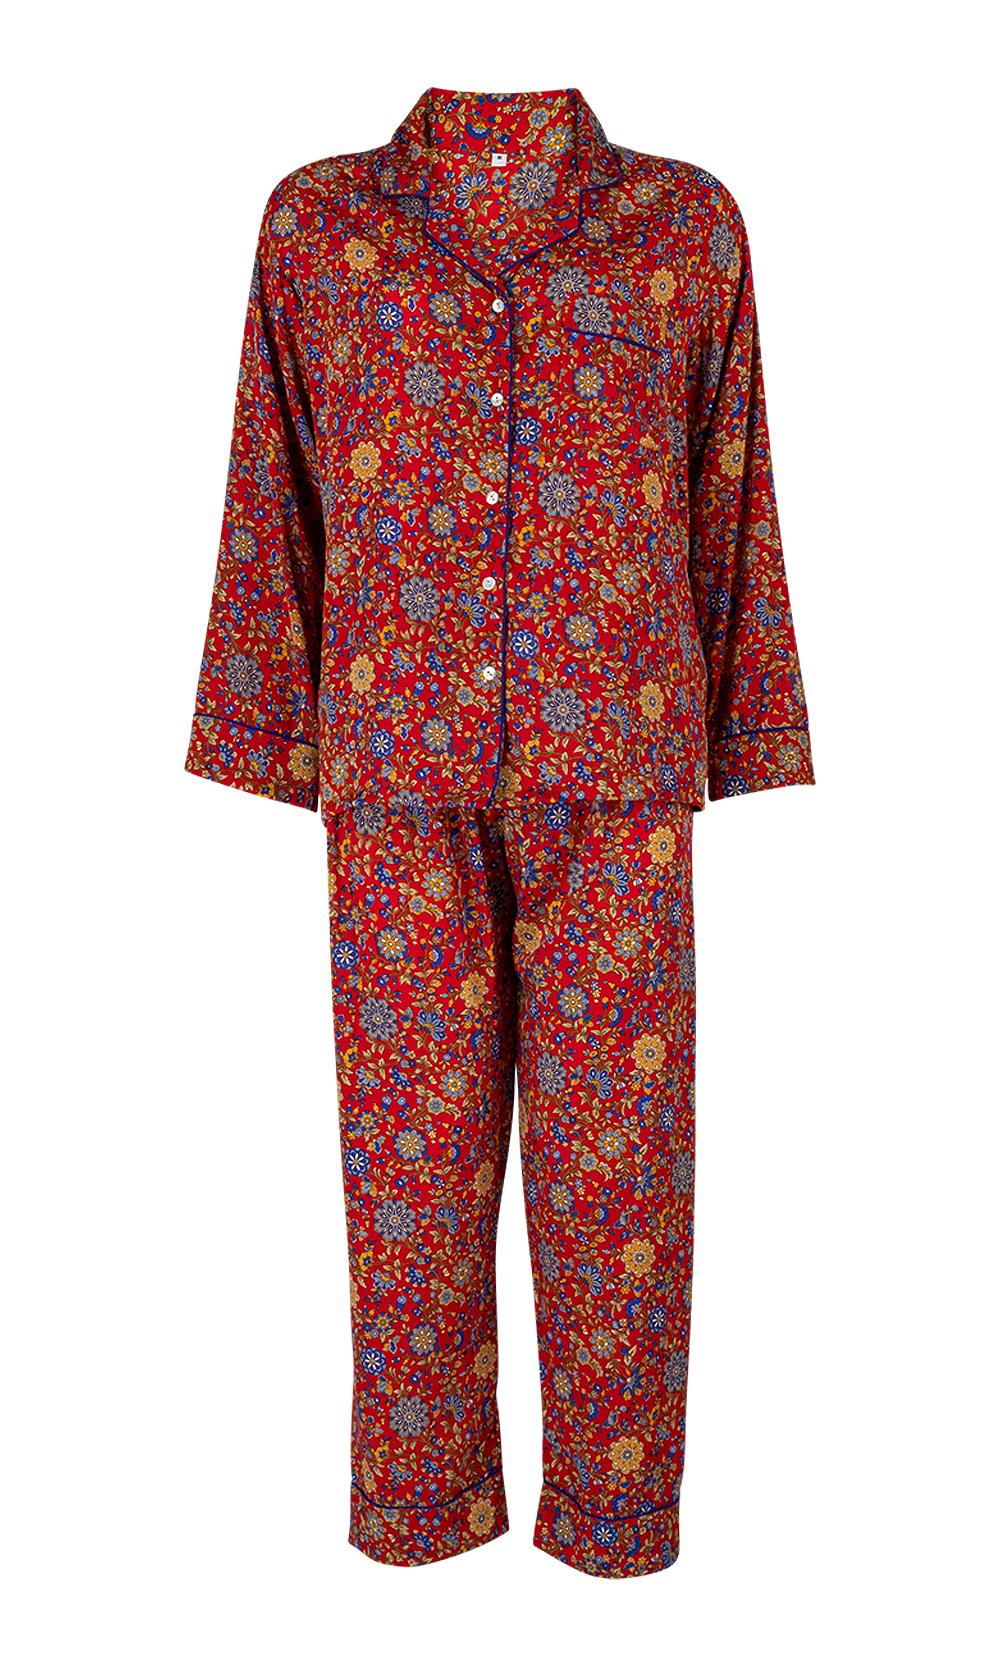 Red Luxurious Sleepwear & Pyjamas Set - Set